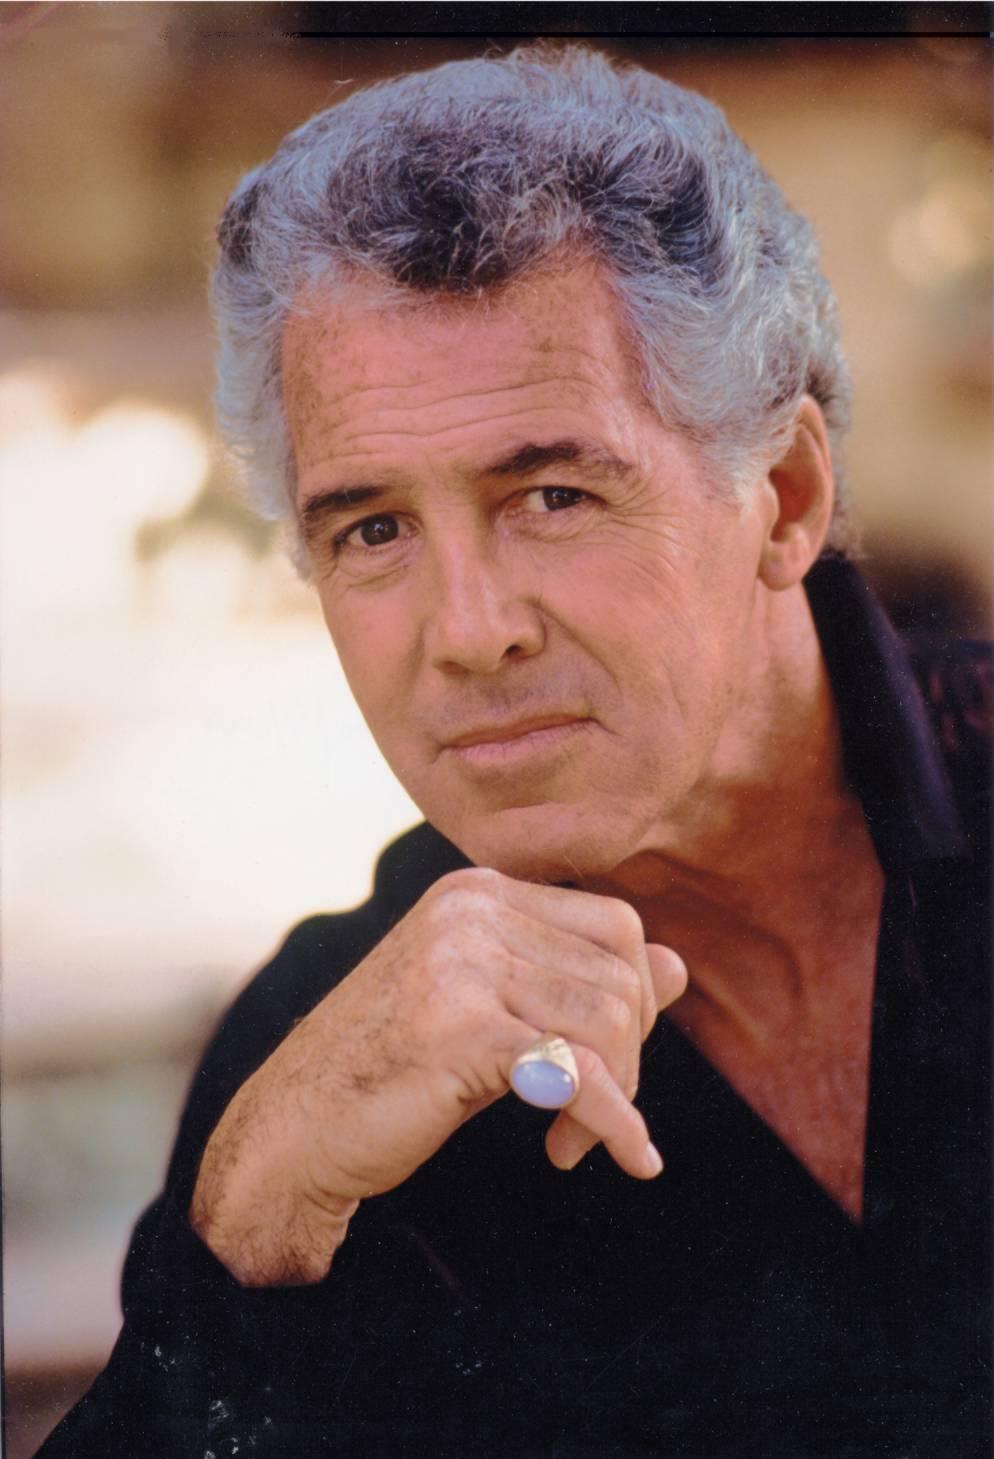 Умер актер из сериала «Санта-Барбара»